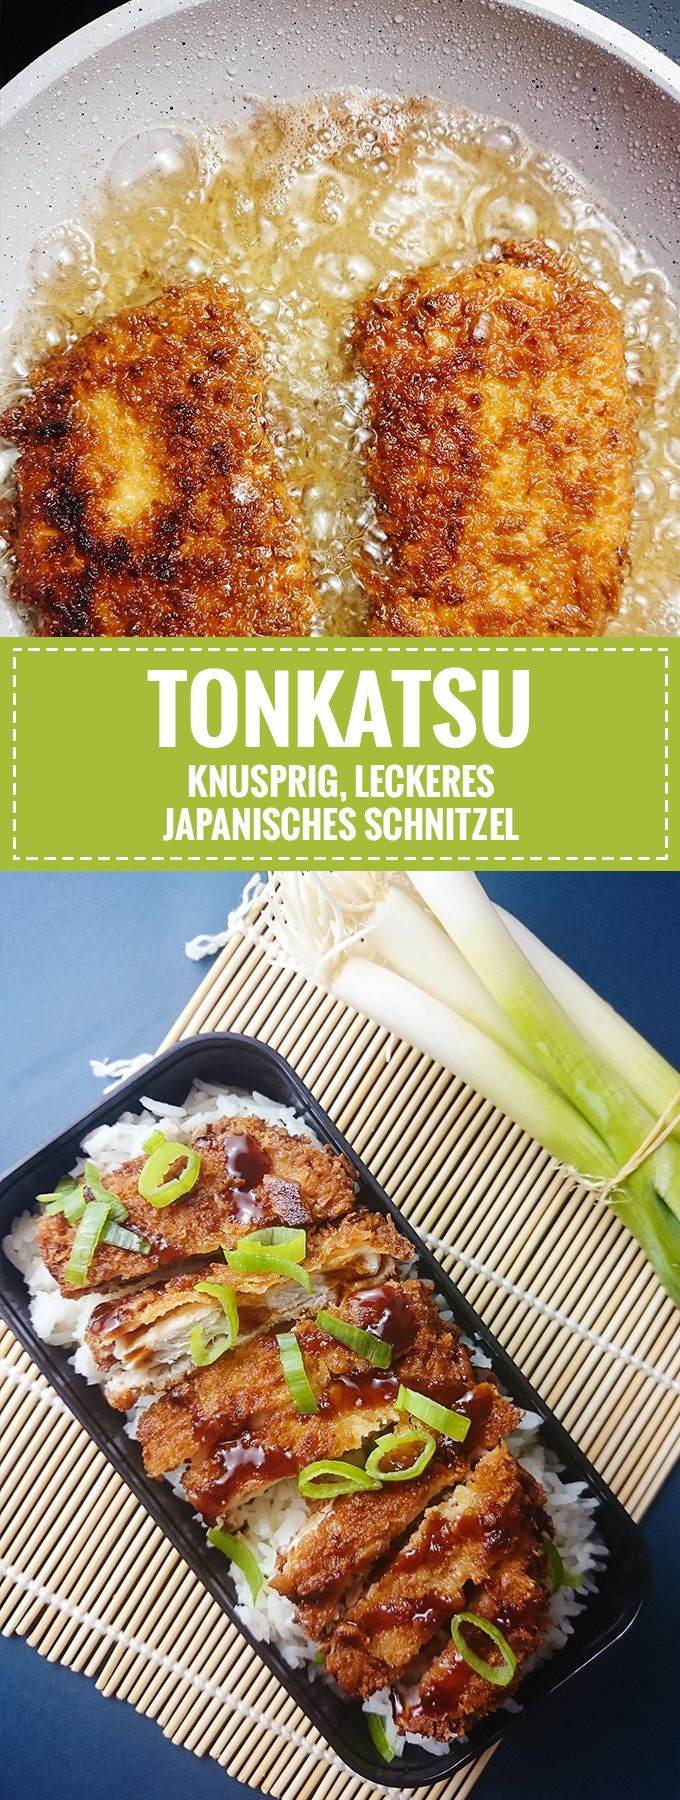 Tonkatsu – Knuspriges japanisches Schnitzel // Knabberkult.de – Knabberkult